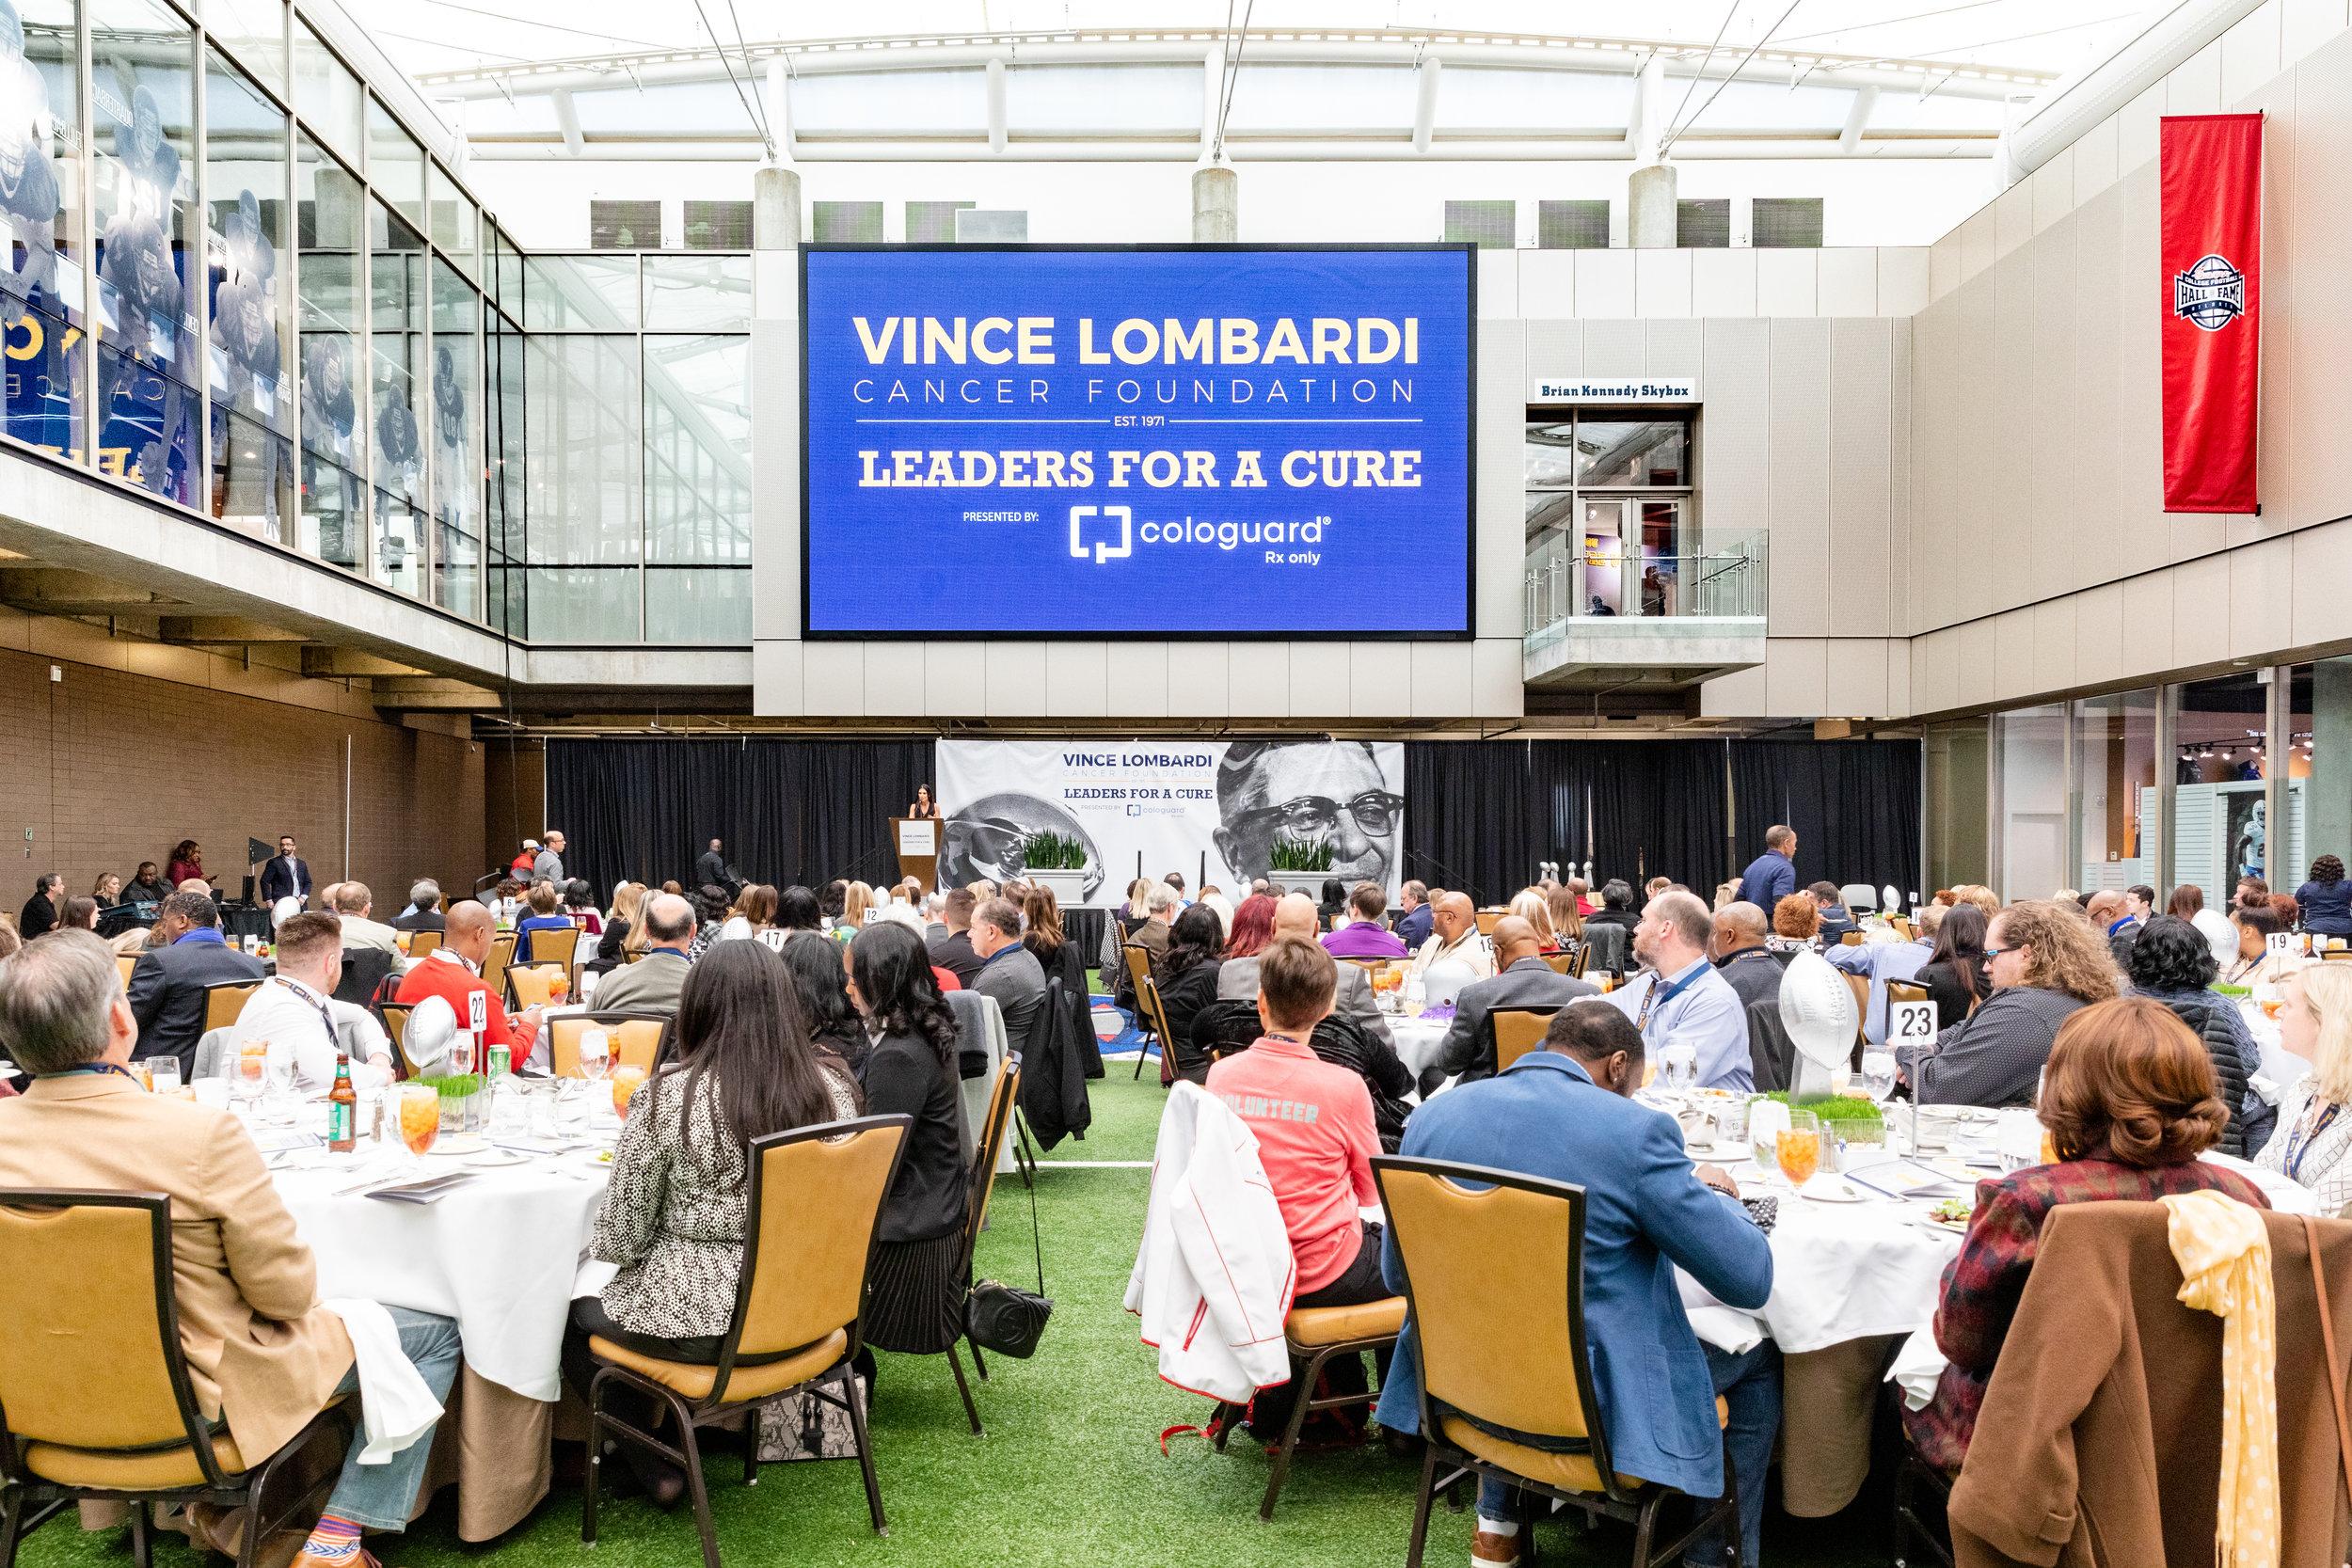 Vince Lombardi Cancer Foundation Event -20190131-0259.jpg